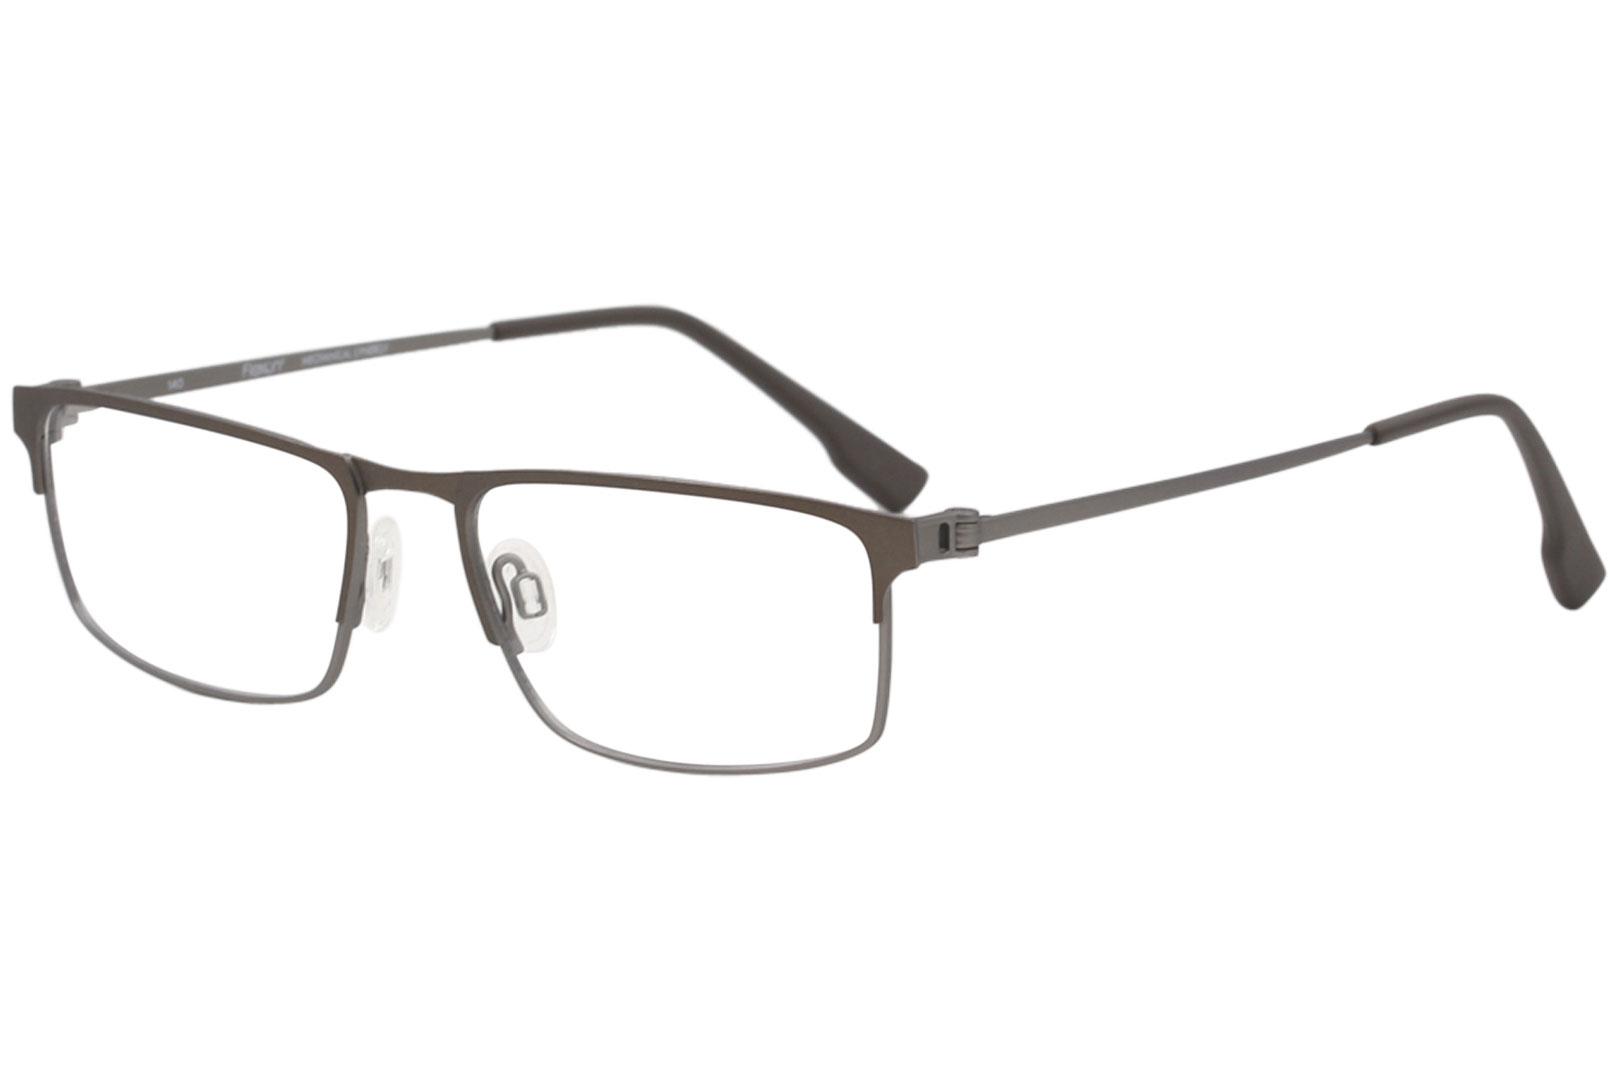 6bd6000ed77 Flexon Men s Eyeglasses E1075 E 1075 210 Brown Gunmetal Optical ...